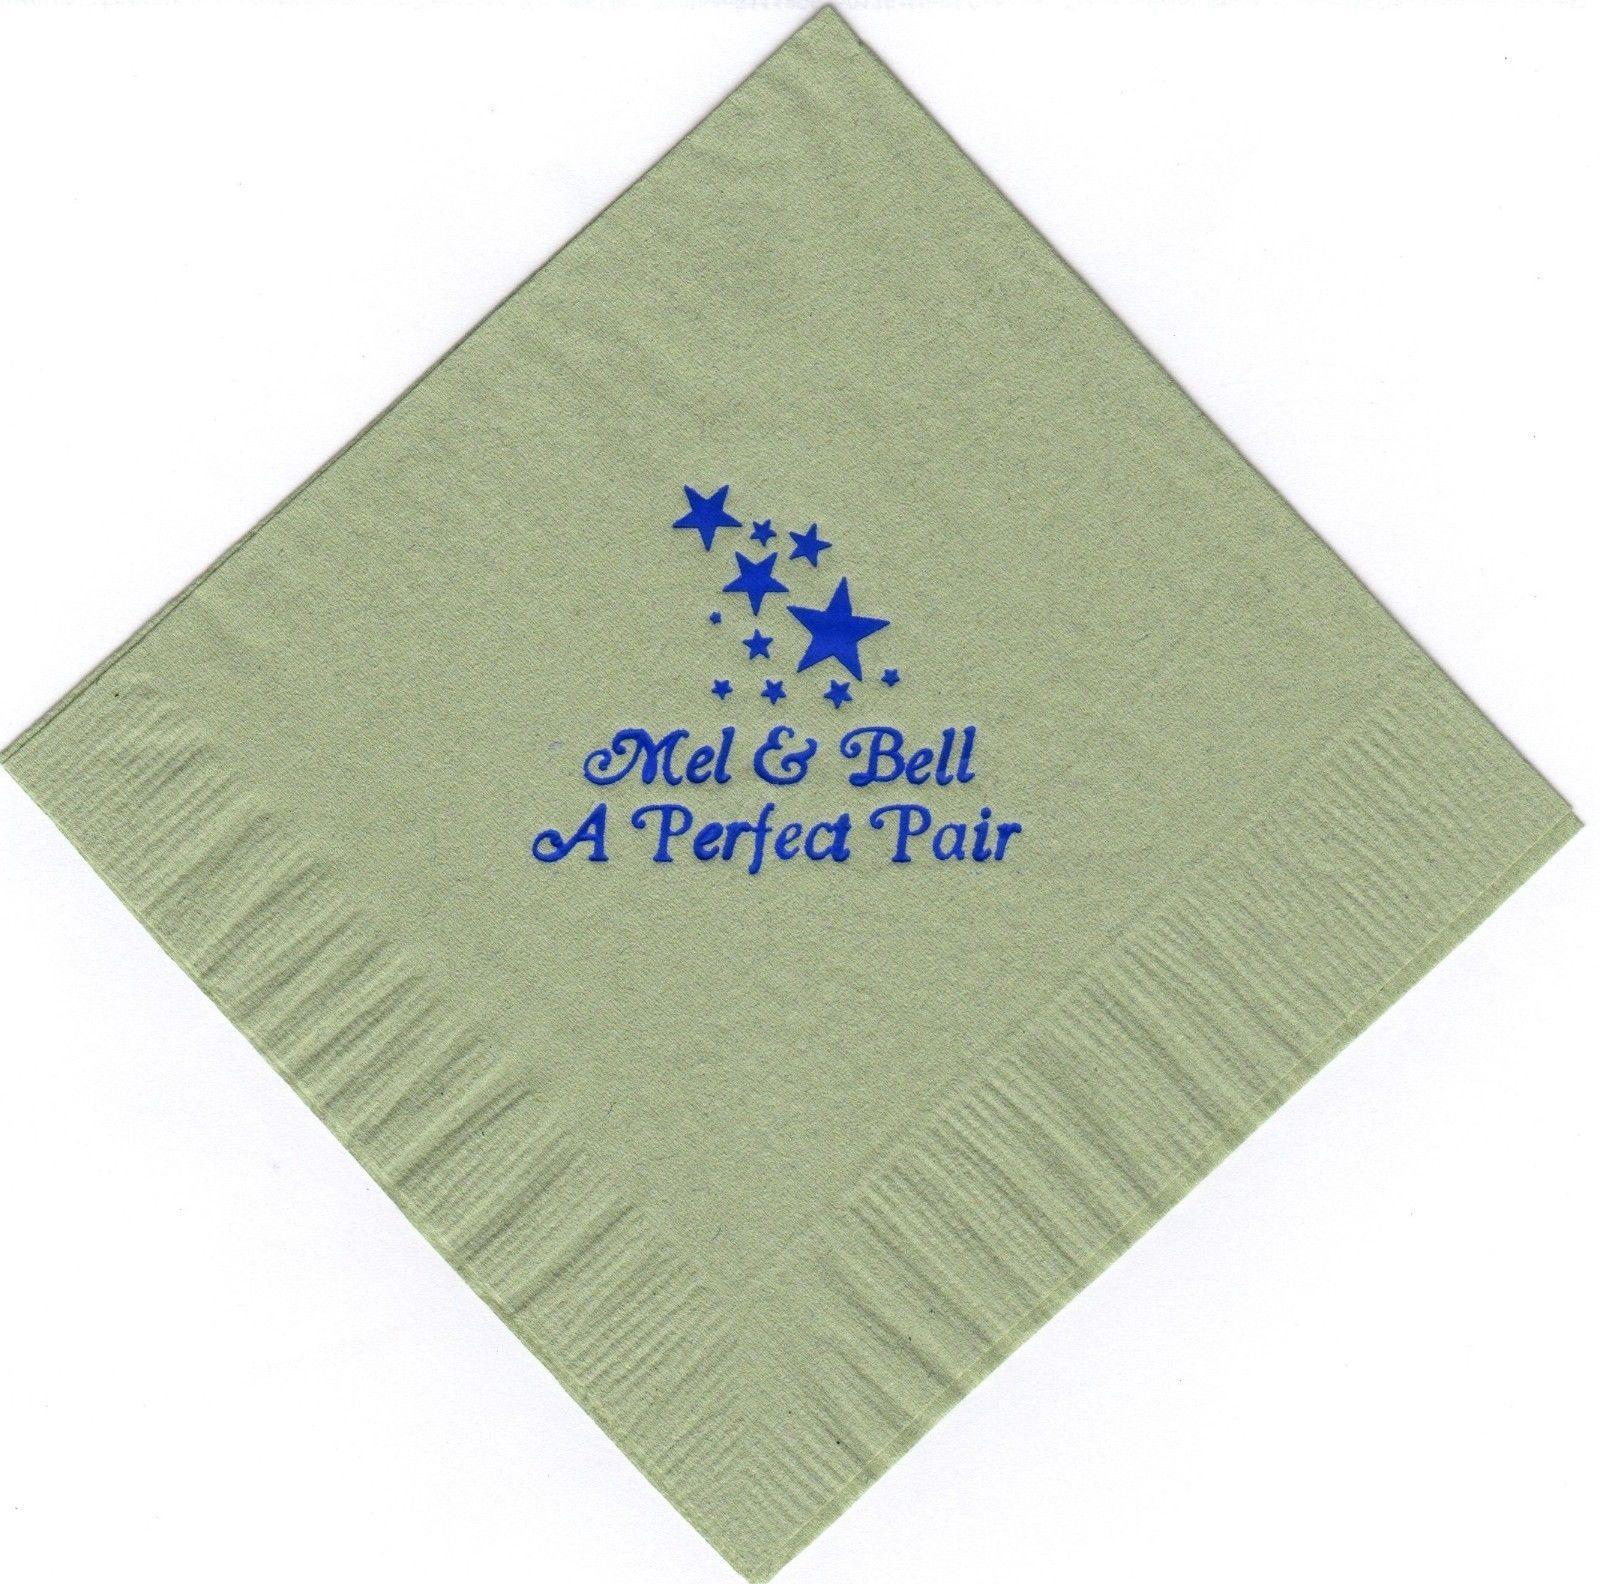 STARS LOGO 50 Personalized printed cocktail beverage napkins